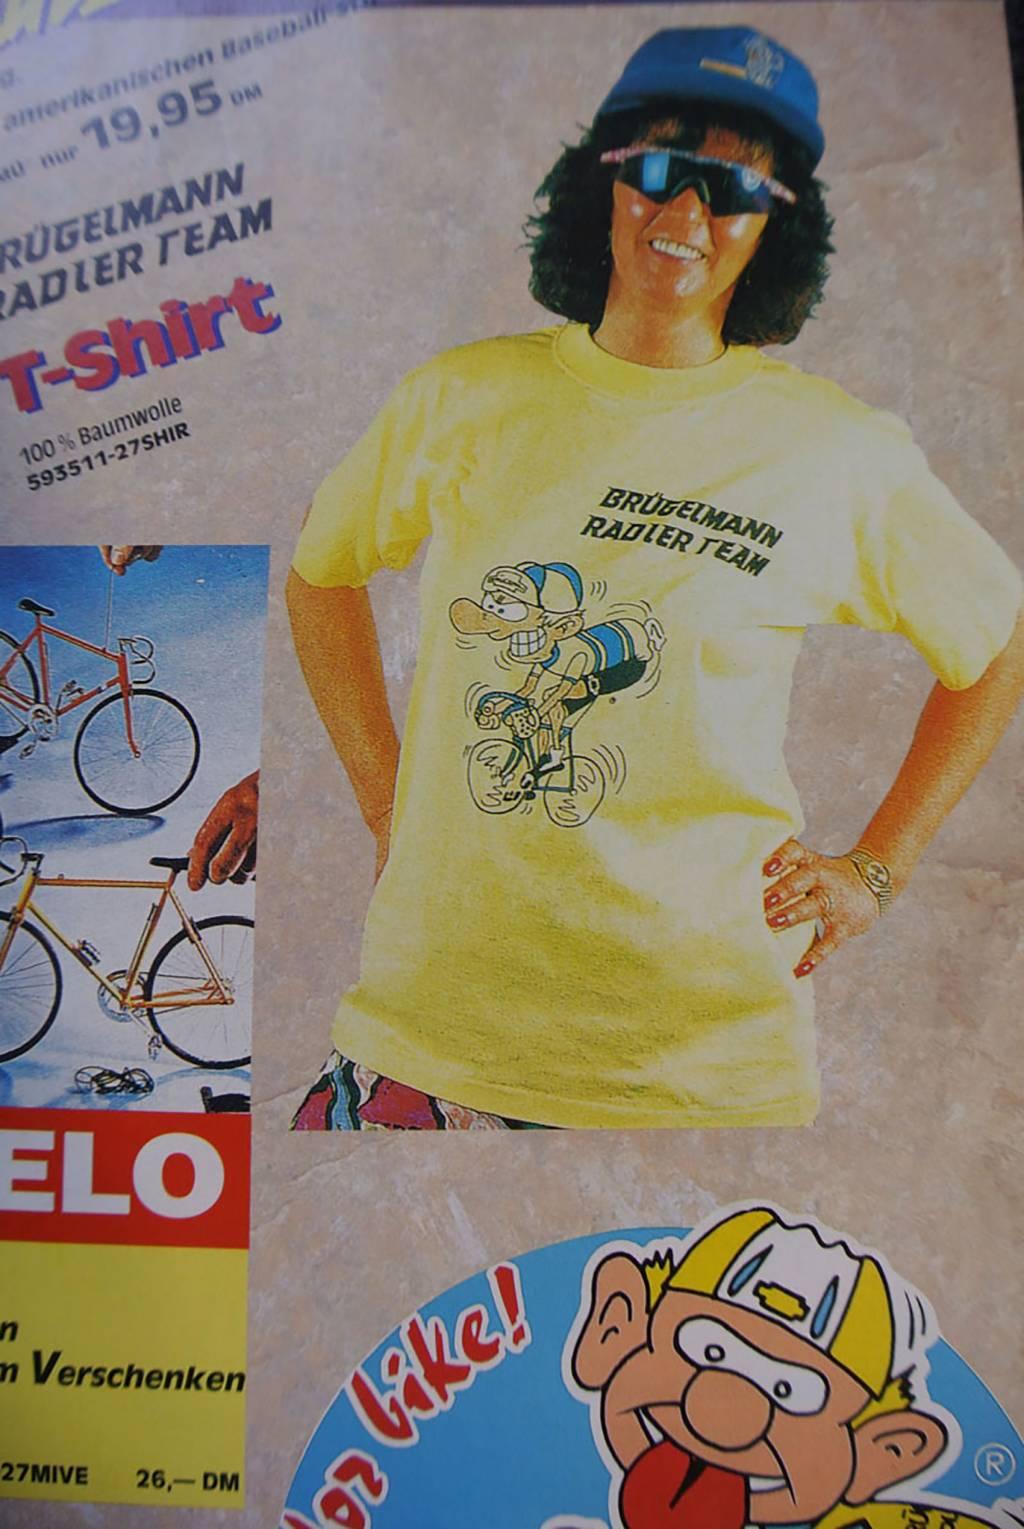 Seite aus Brügelmann Katalog 1995